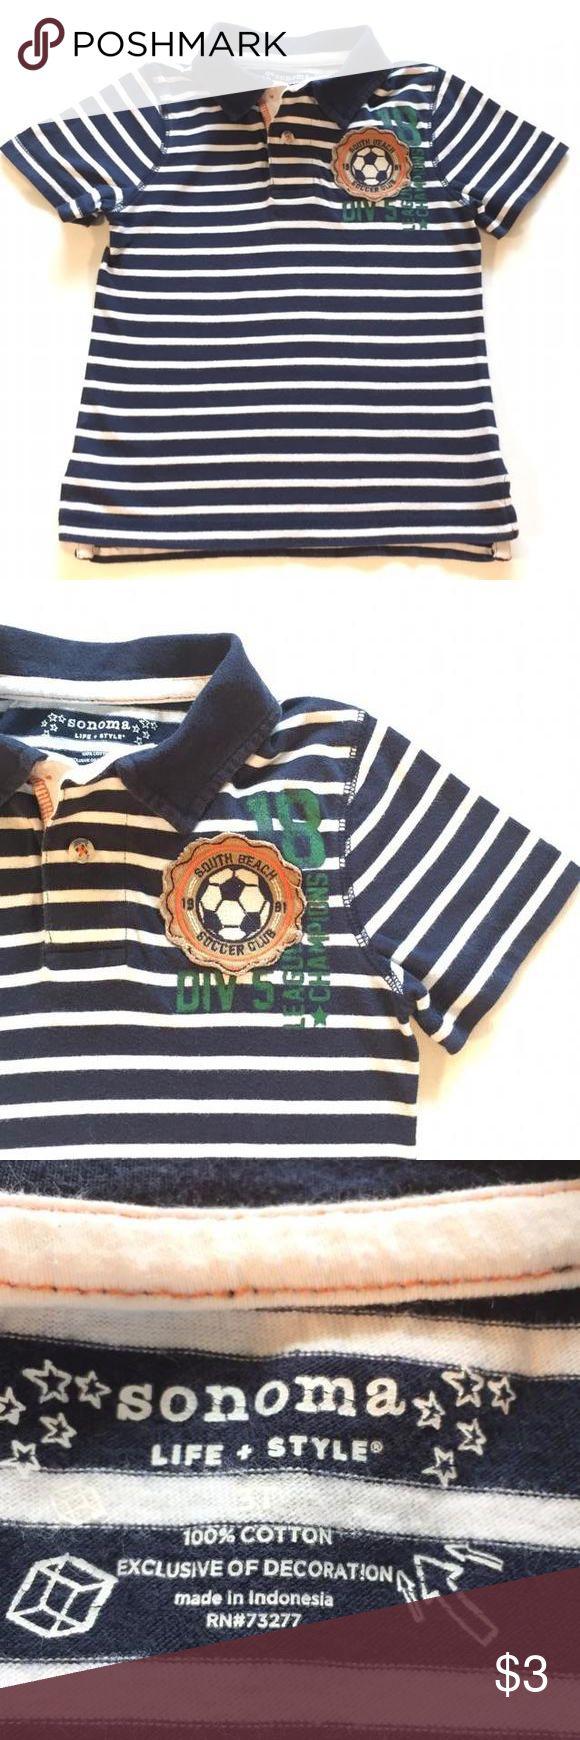 Sonoma Navy & White Striped Polo Shirt Sonoma Navy & White Striped Polo Shirt, soccer appliqué on chest. Good condition due to light wash wear. Sonoma Shirts & Tops